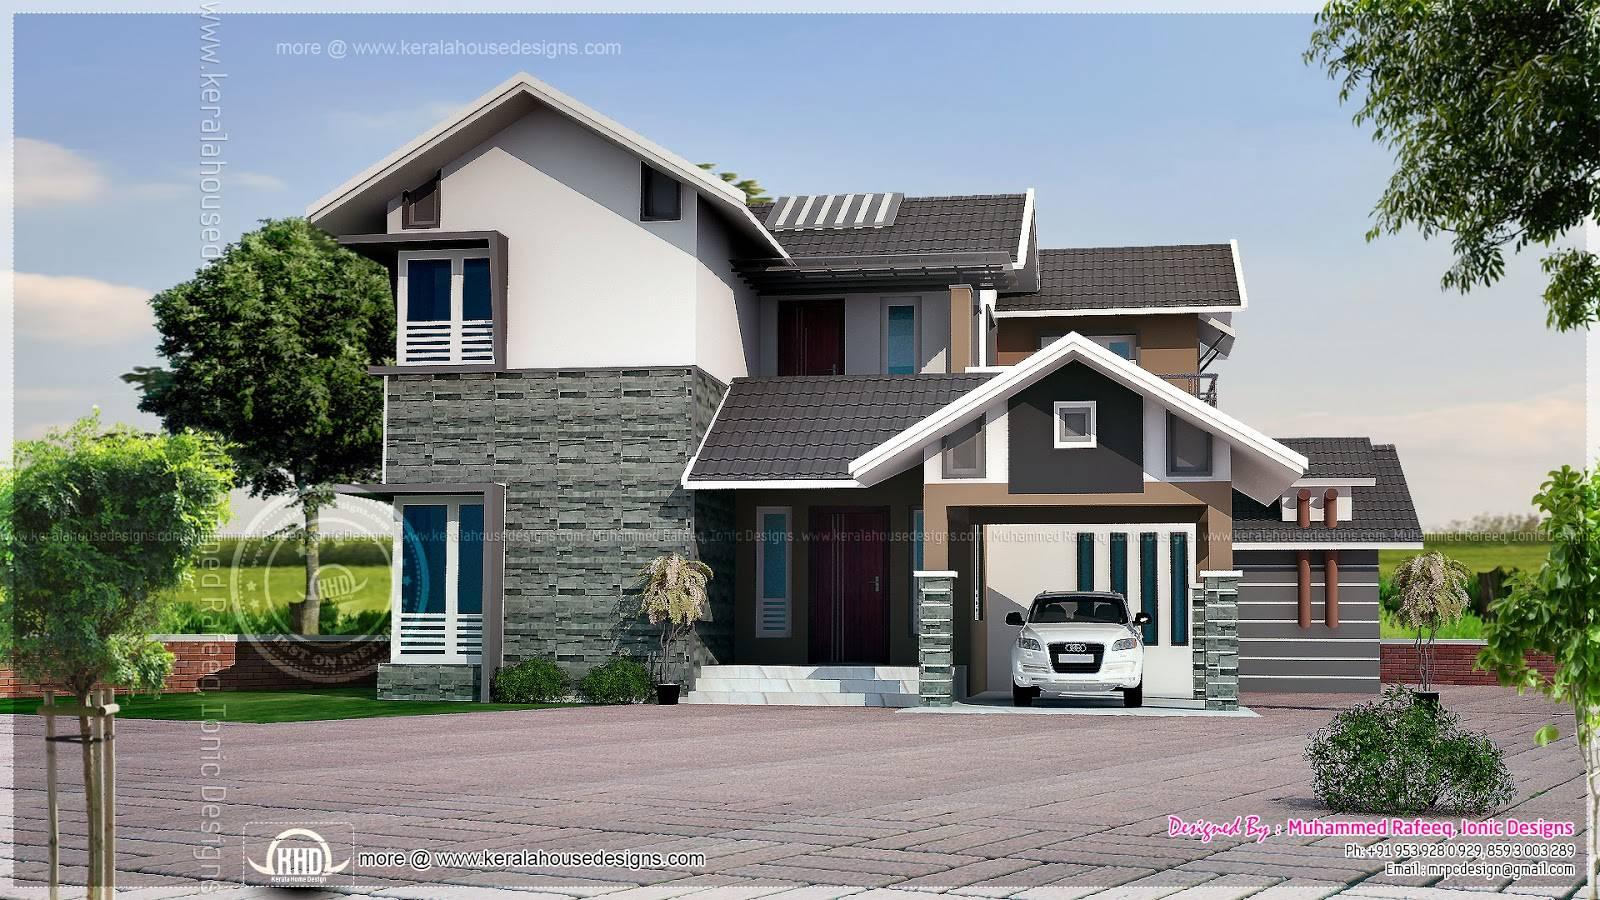 House Plans Simple Elevation Slope Roof Home Plans Blueprints 47259